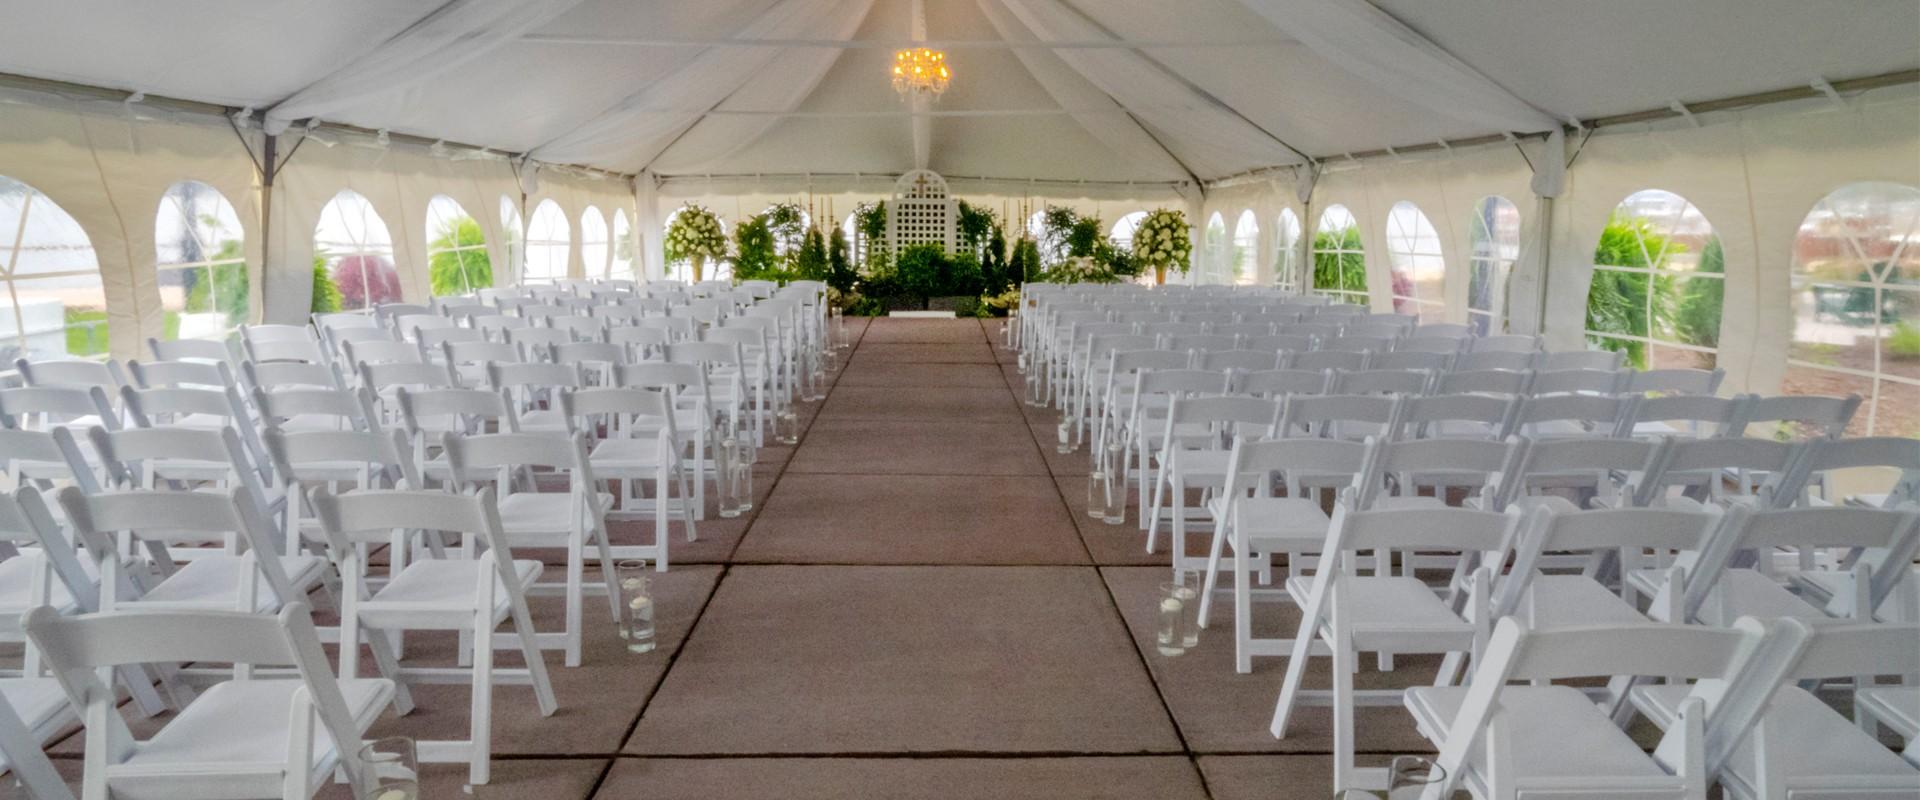 Weddings On Chautauqua Lake Ny Chautauqua Harbor Hotel